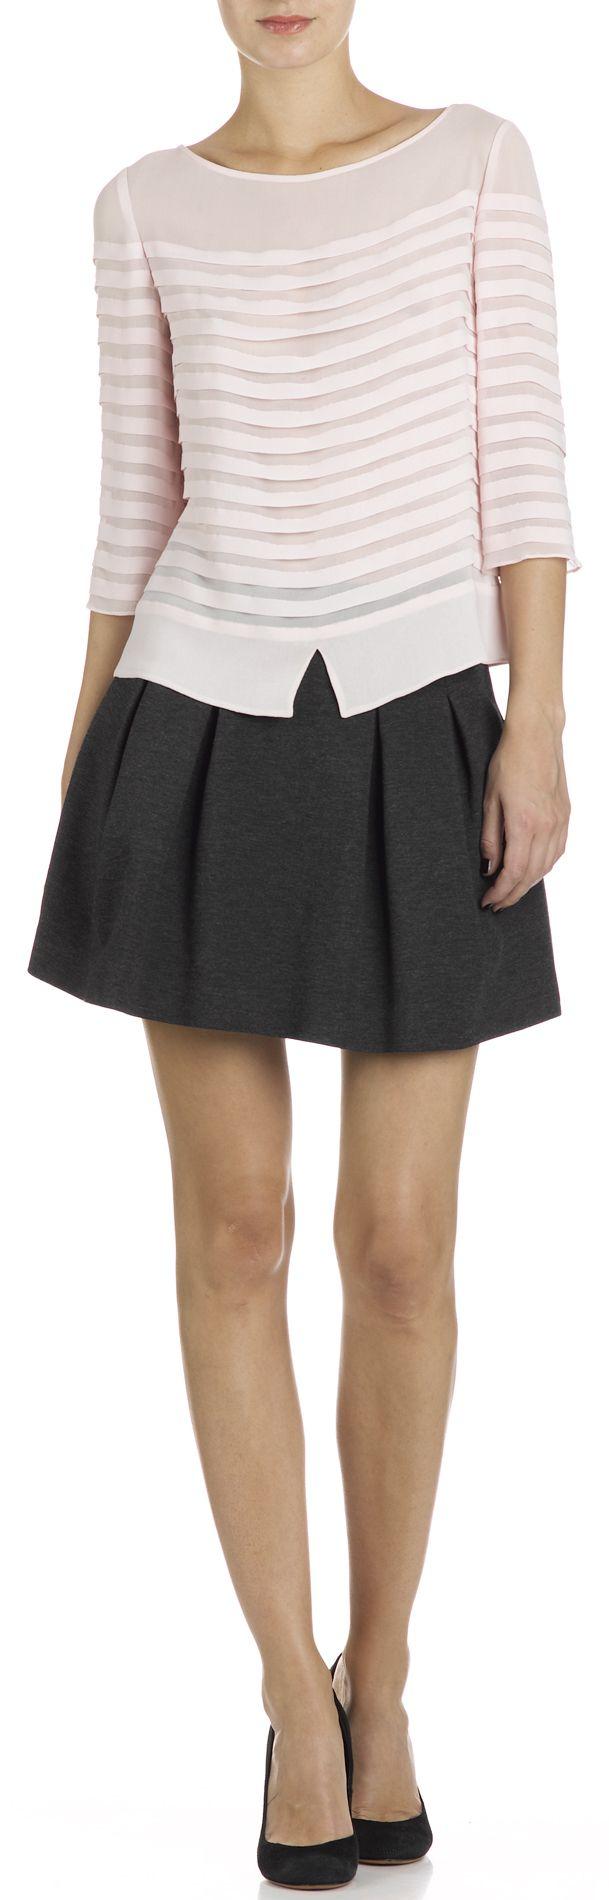 Claudie Pierlot Woman Floral-print Leather -trimmed Suede Sneakers Blush Size 36 Claudie Pierlot iapT9